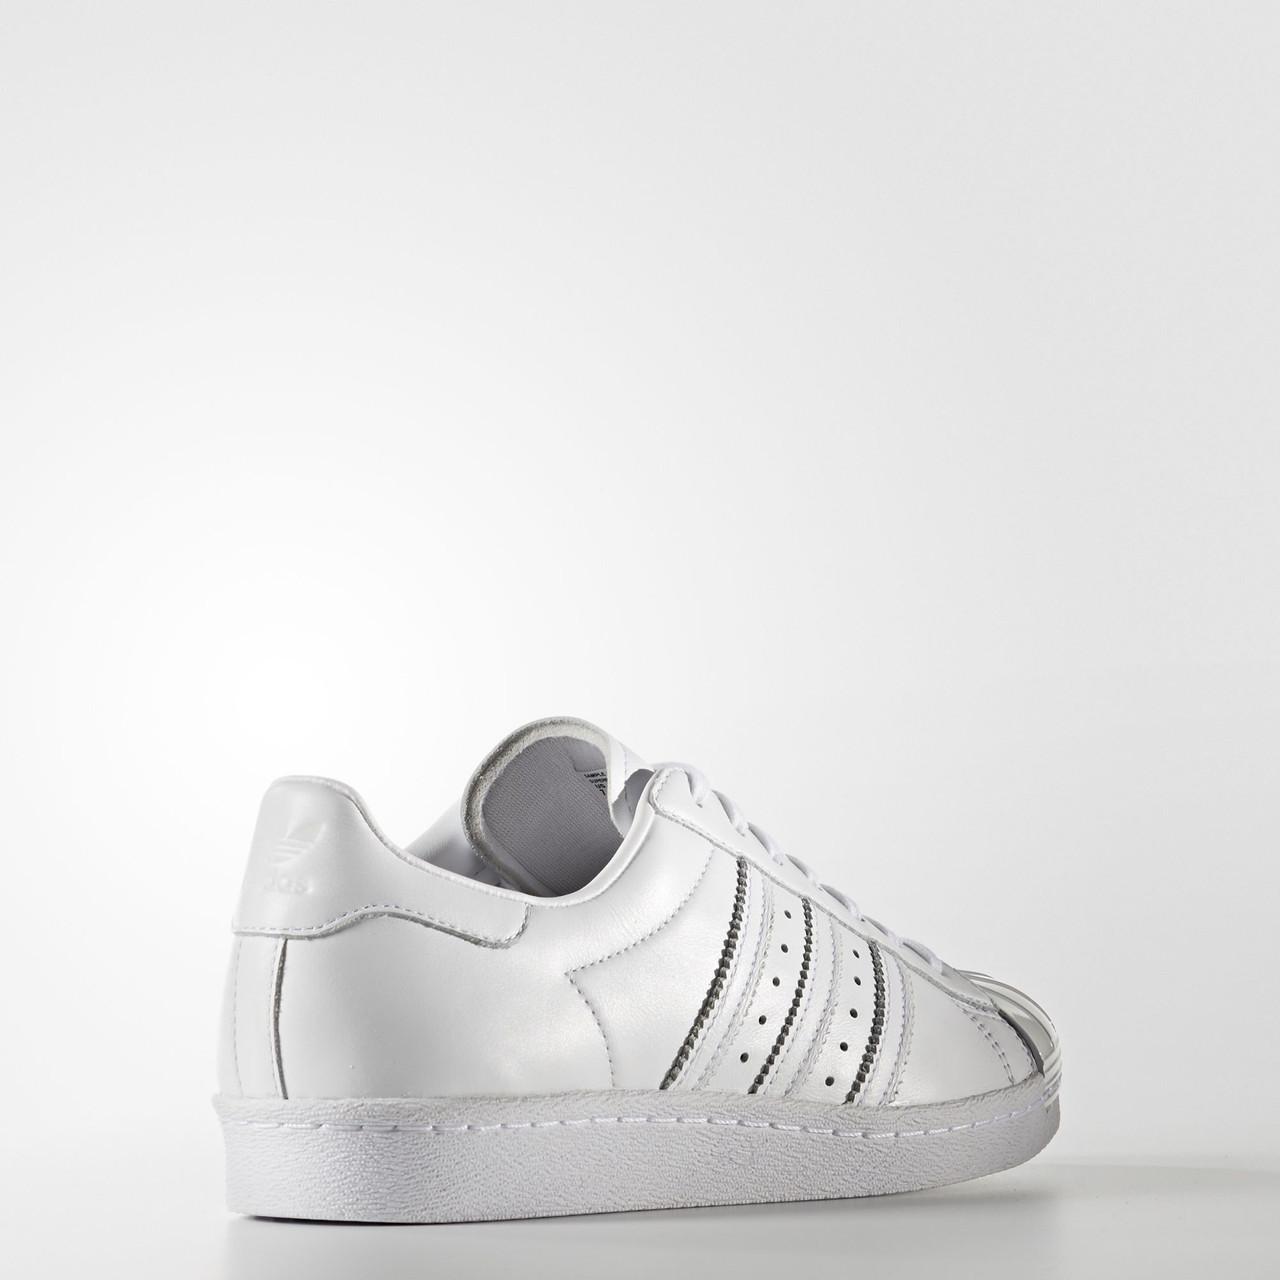 ... Женские кроссовки adidas originals superstar 80s (Артикул  S76540), ... a7674d46a16